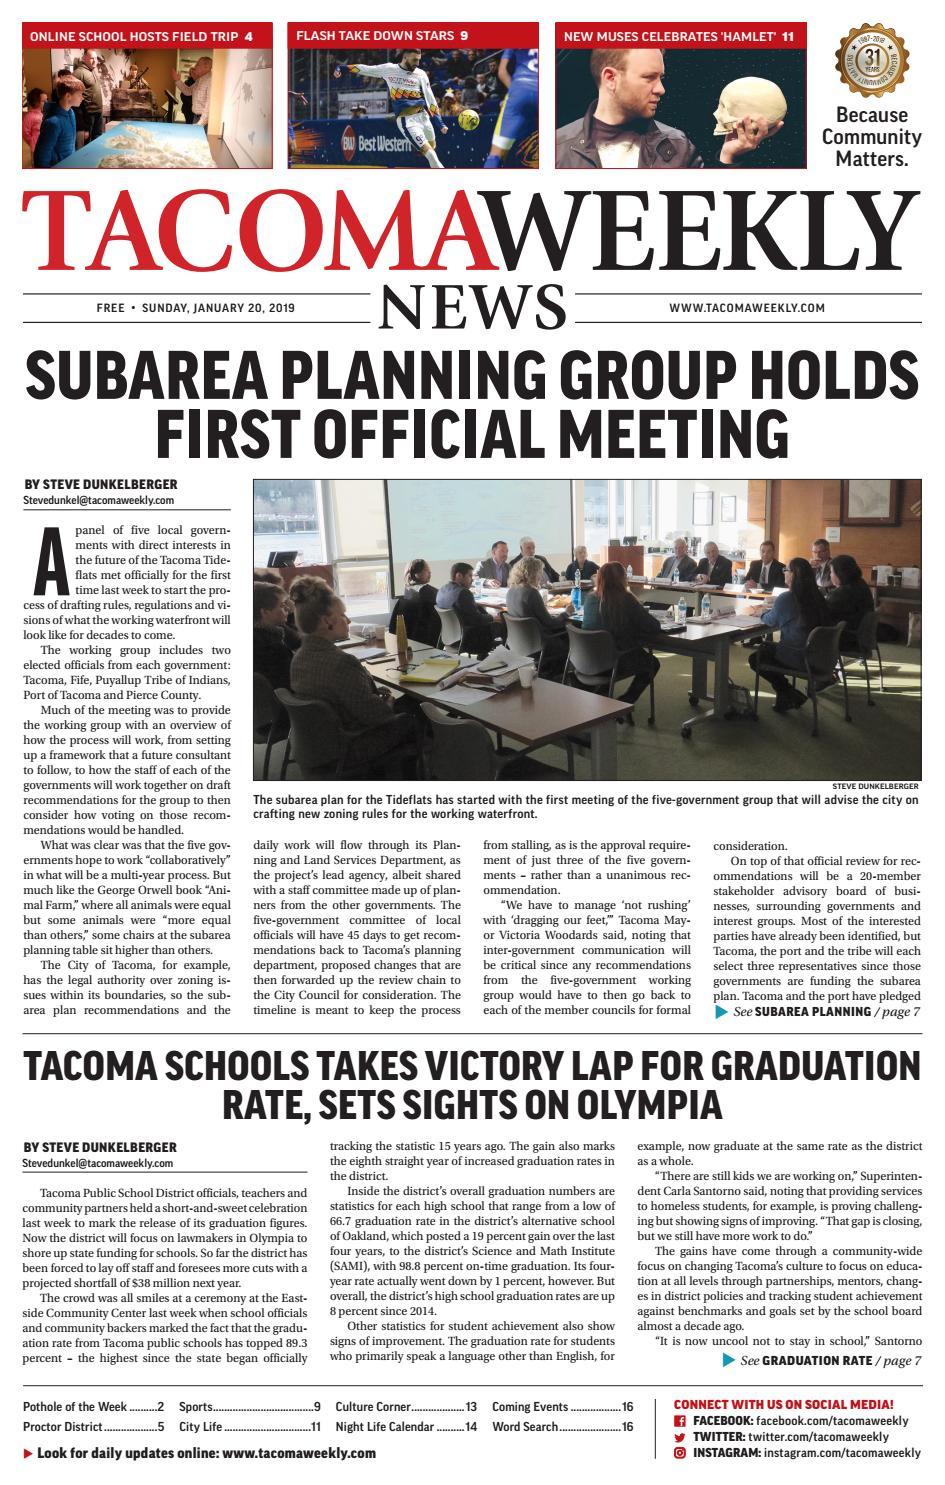 Tacoma Weekly 01.20.19 by Tacoma Weekly News - issuu c744c8181